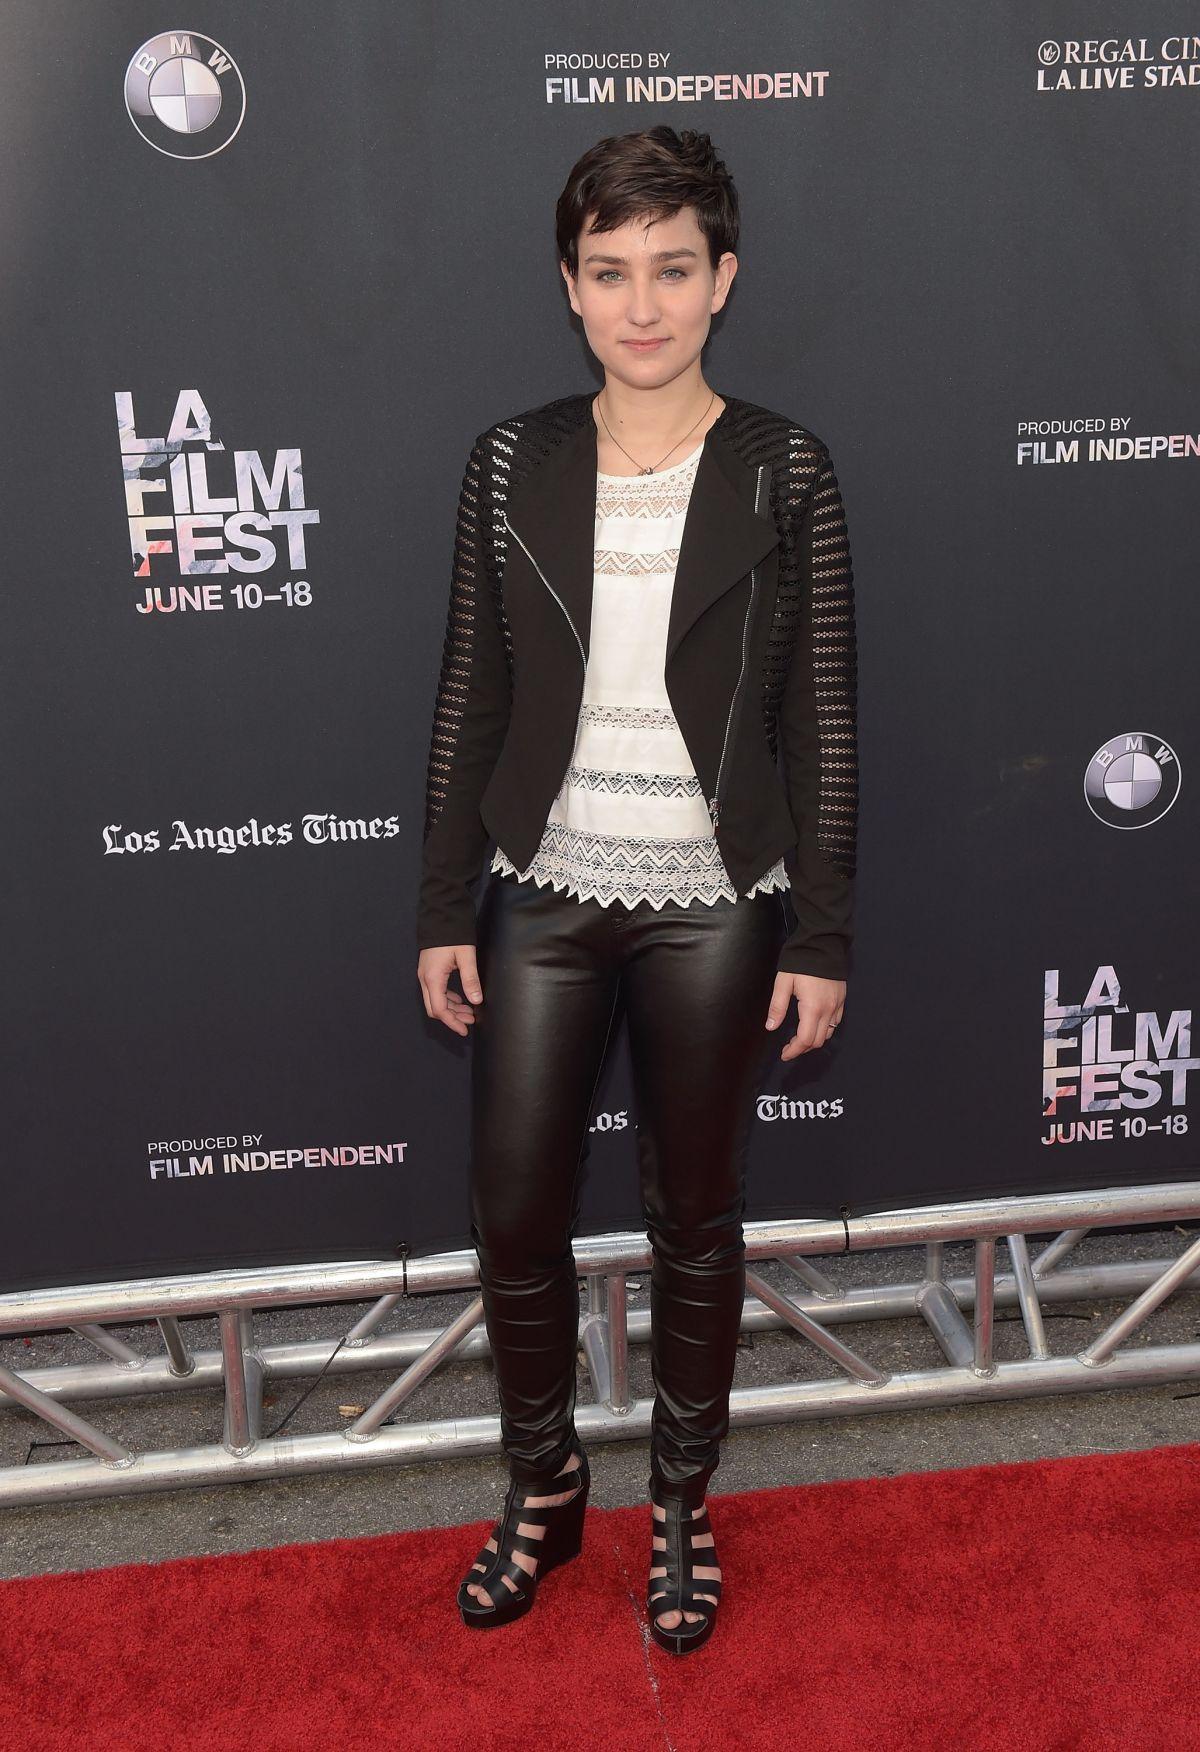 BEX TAYLOR-KLAUS at Scream Premiere at LA Film Festival